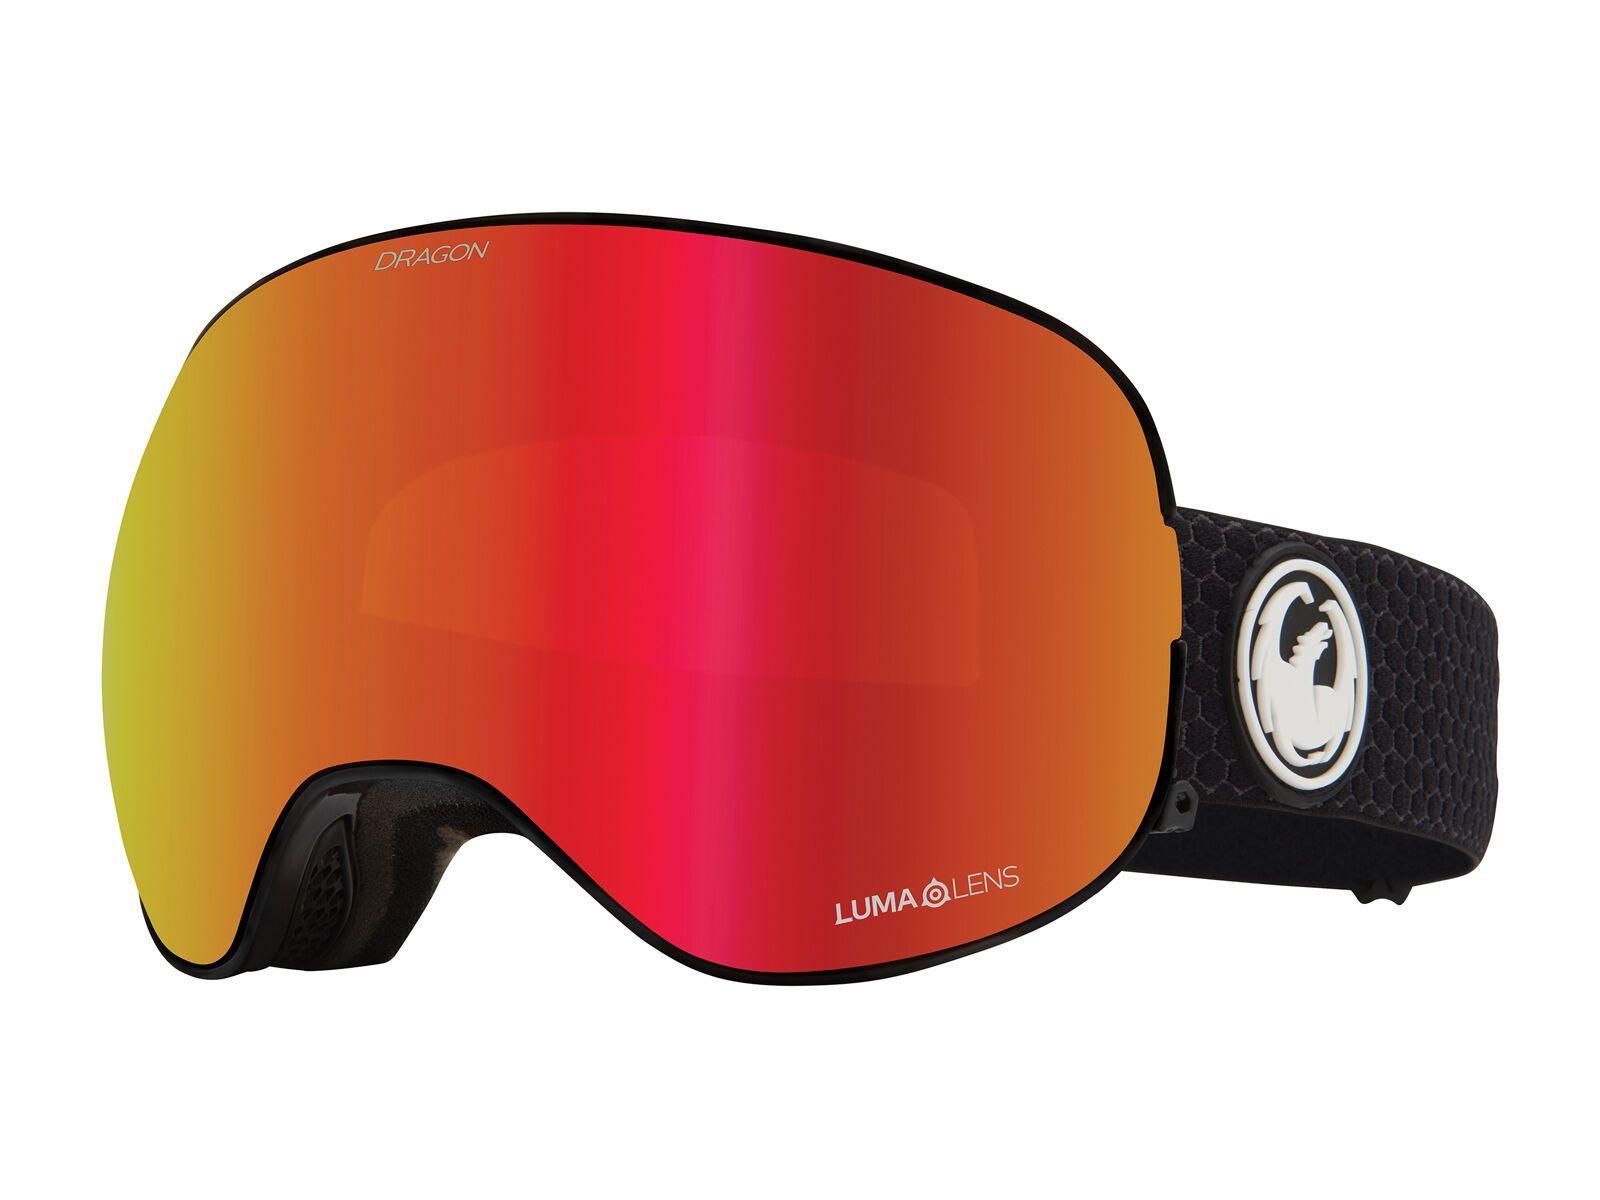 Dragon X2 inkl. WS, split/Lens: lumalens red ion - Skibrille 404547728614